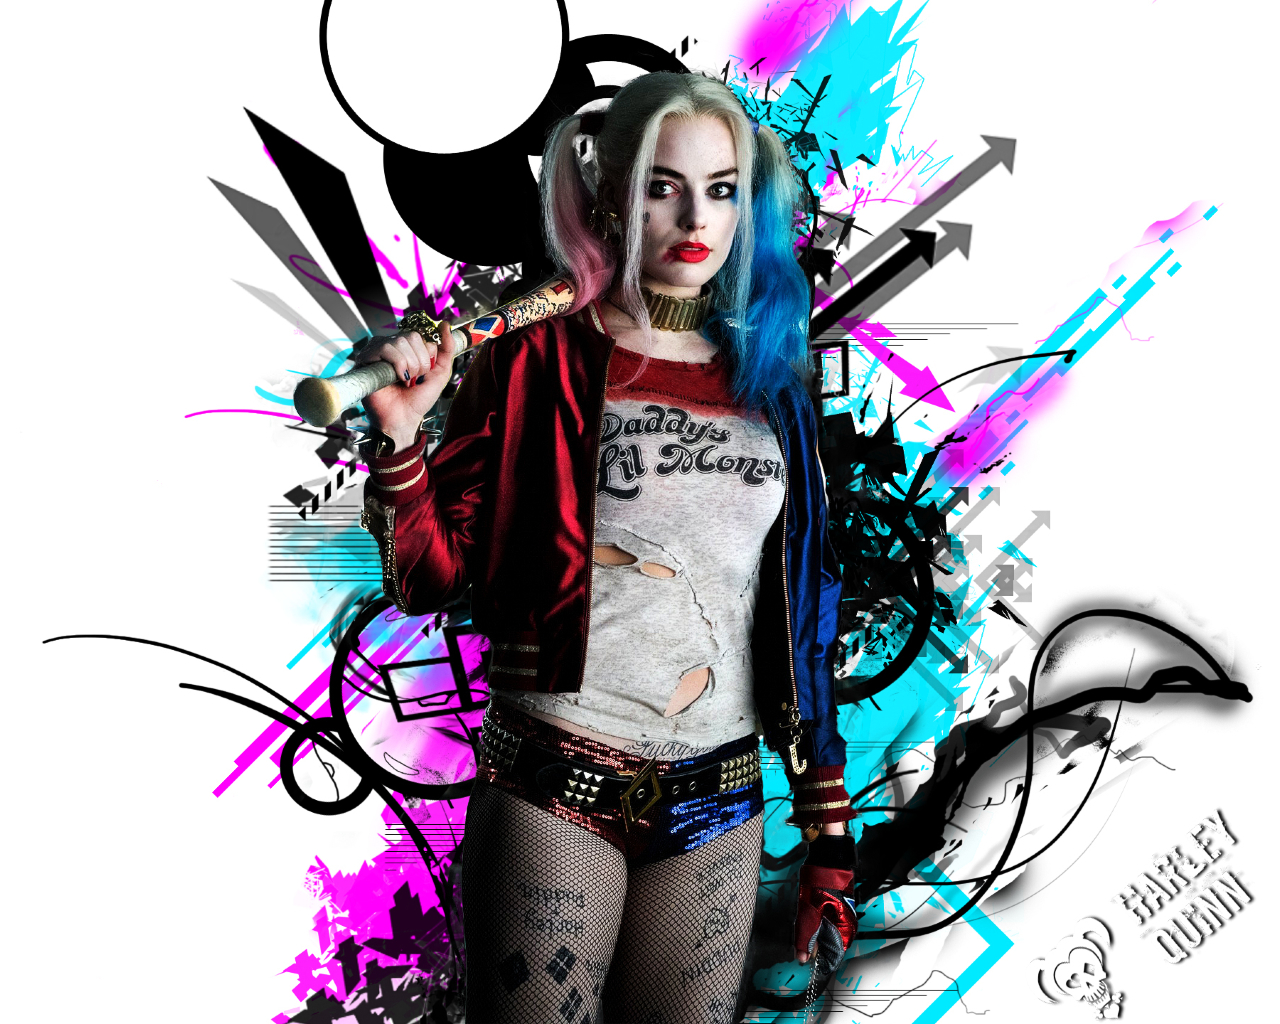 1280x1024 Harley Quinn 1280x1024 Resolution Wallpaper, HD ...